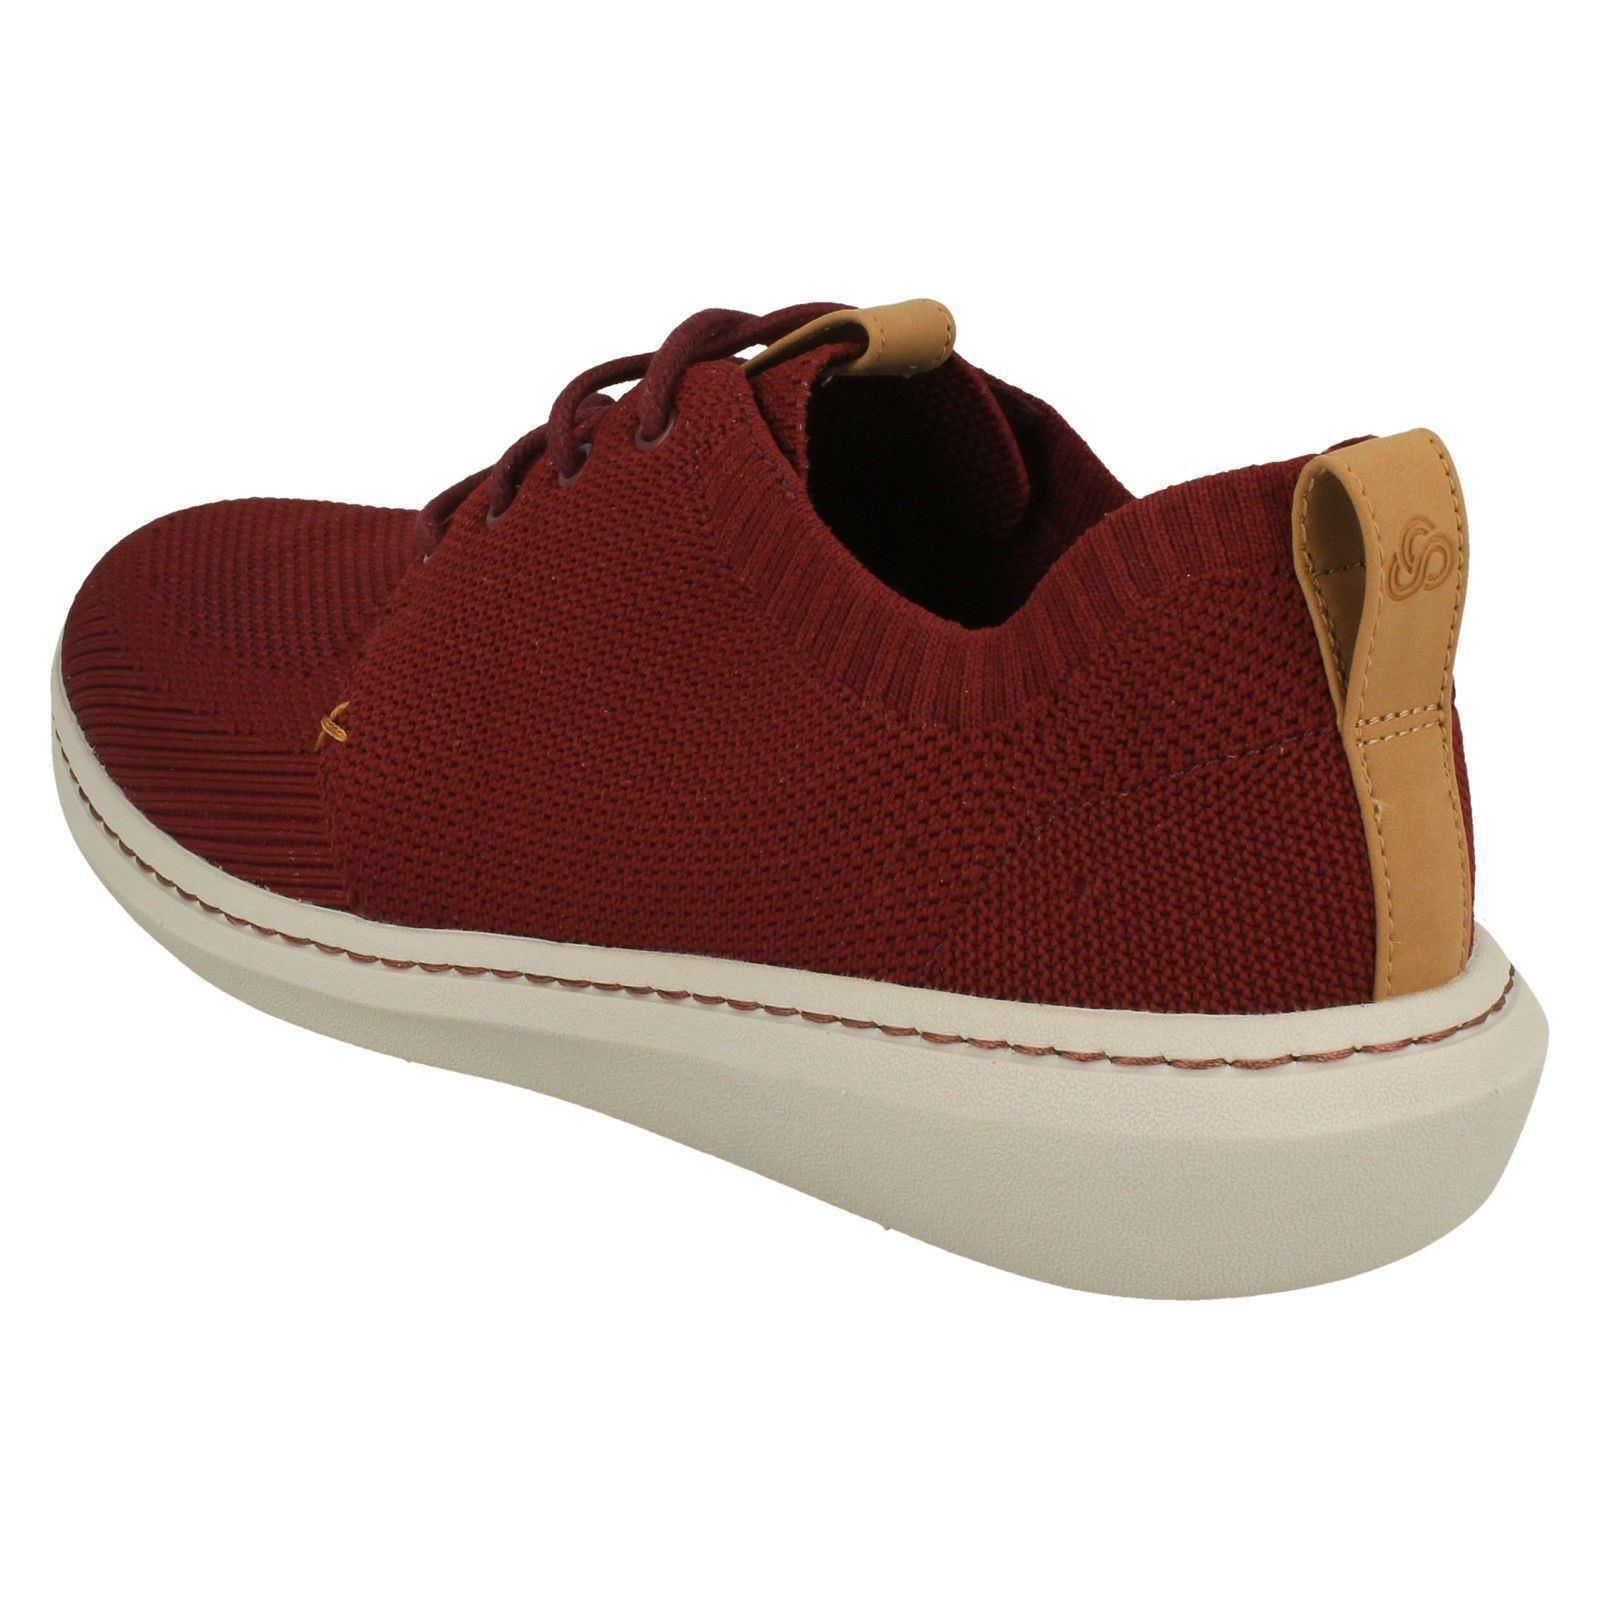 Mix Casual Clarks Cordones Zapatos Urban Con Paso Hombre 7Pq10wxq